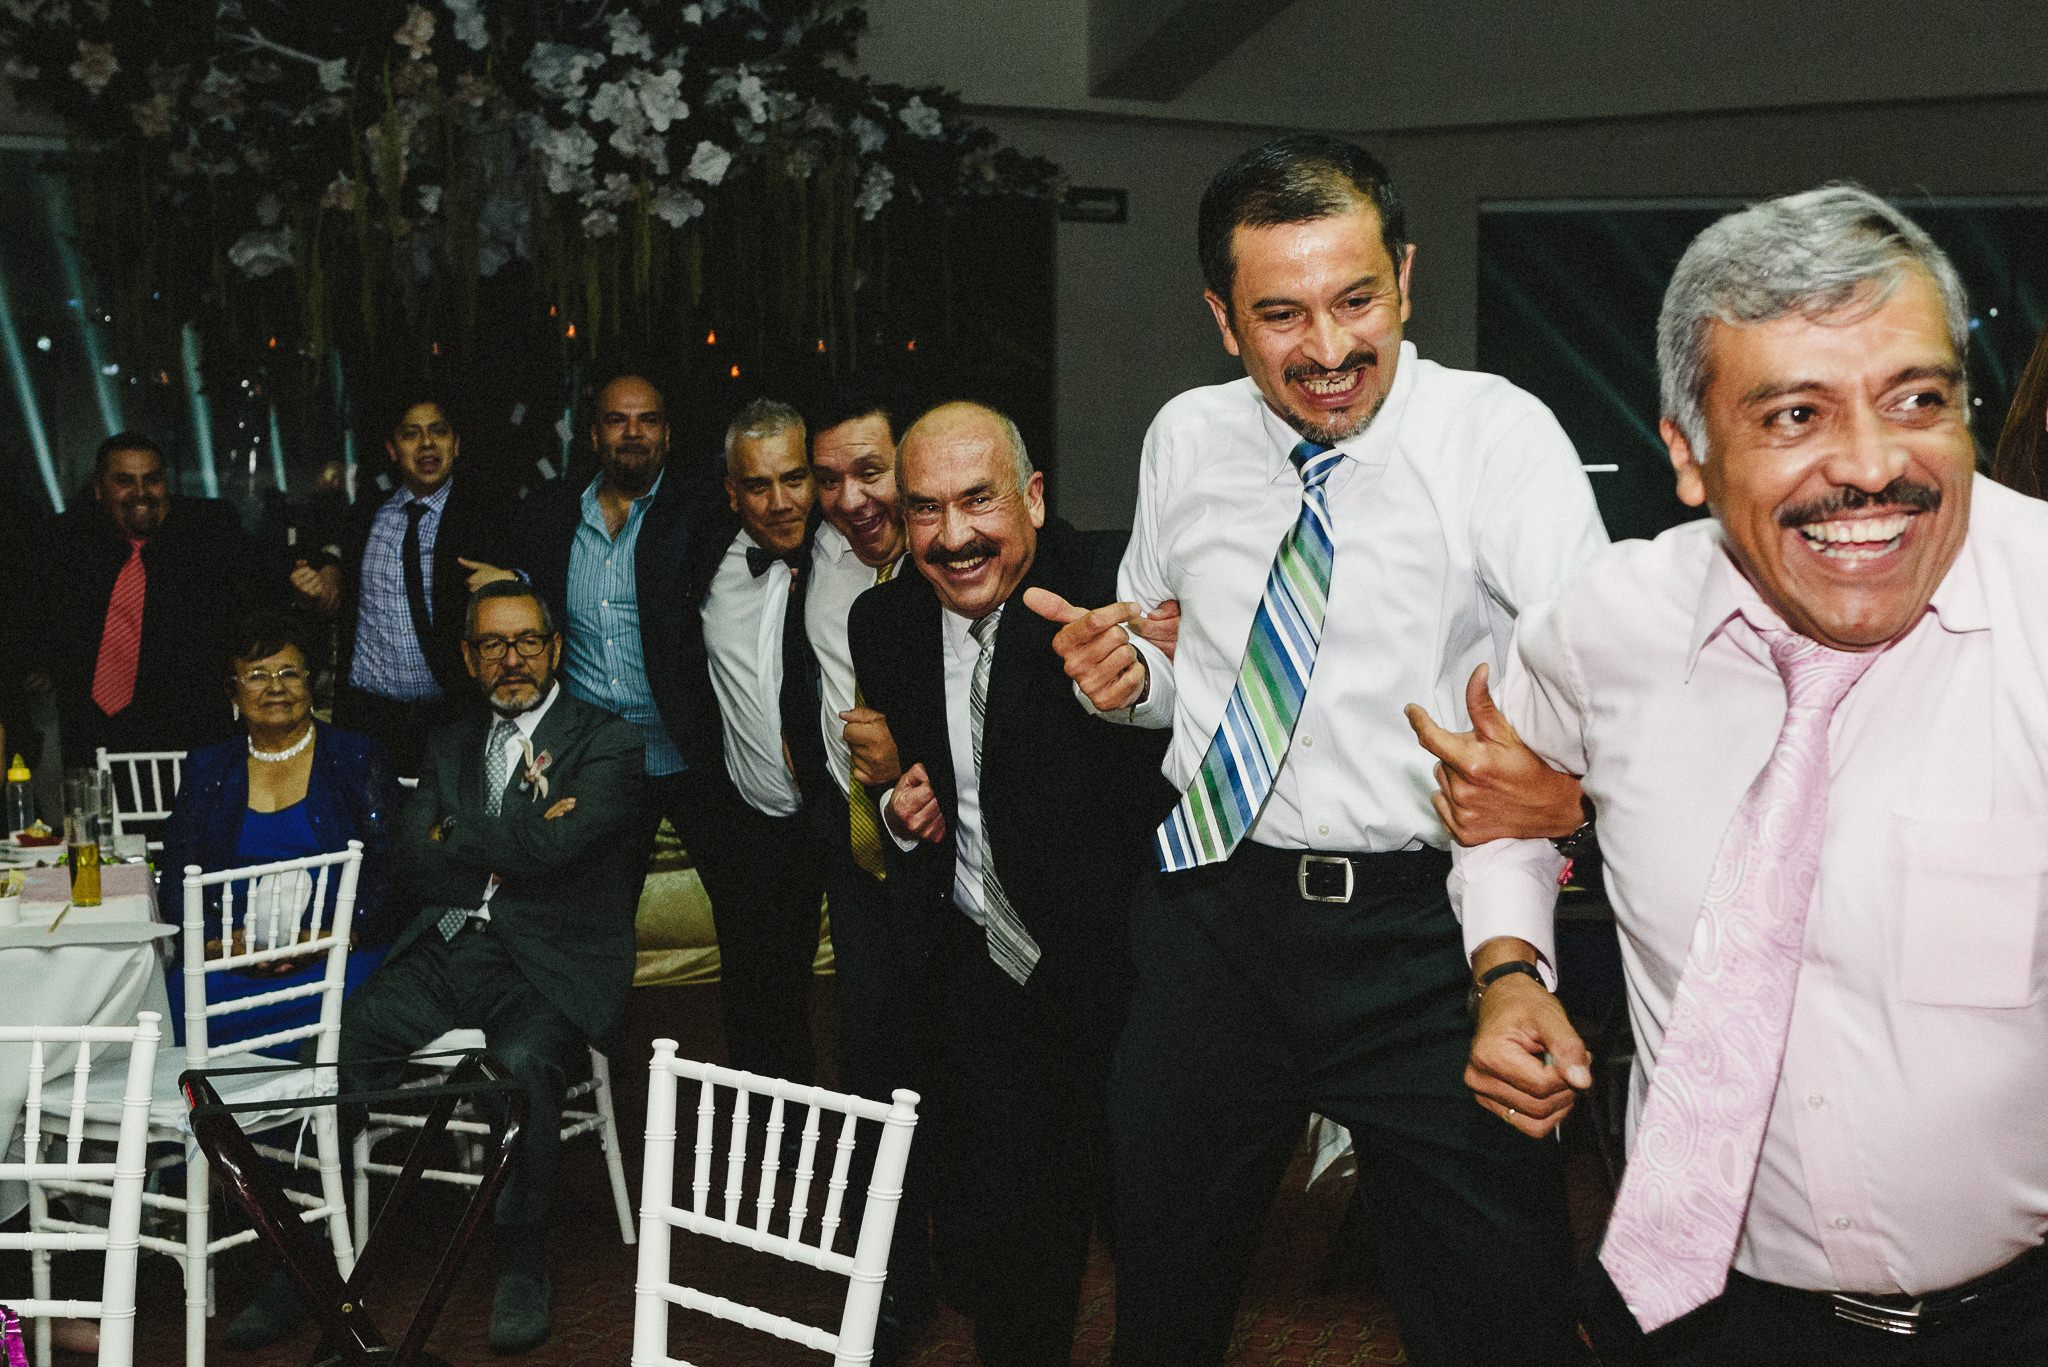 Wedding-Boda-Tulancingo-Hidalgo-Salon-Essenzia-Luis-Houdin-69-film